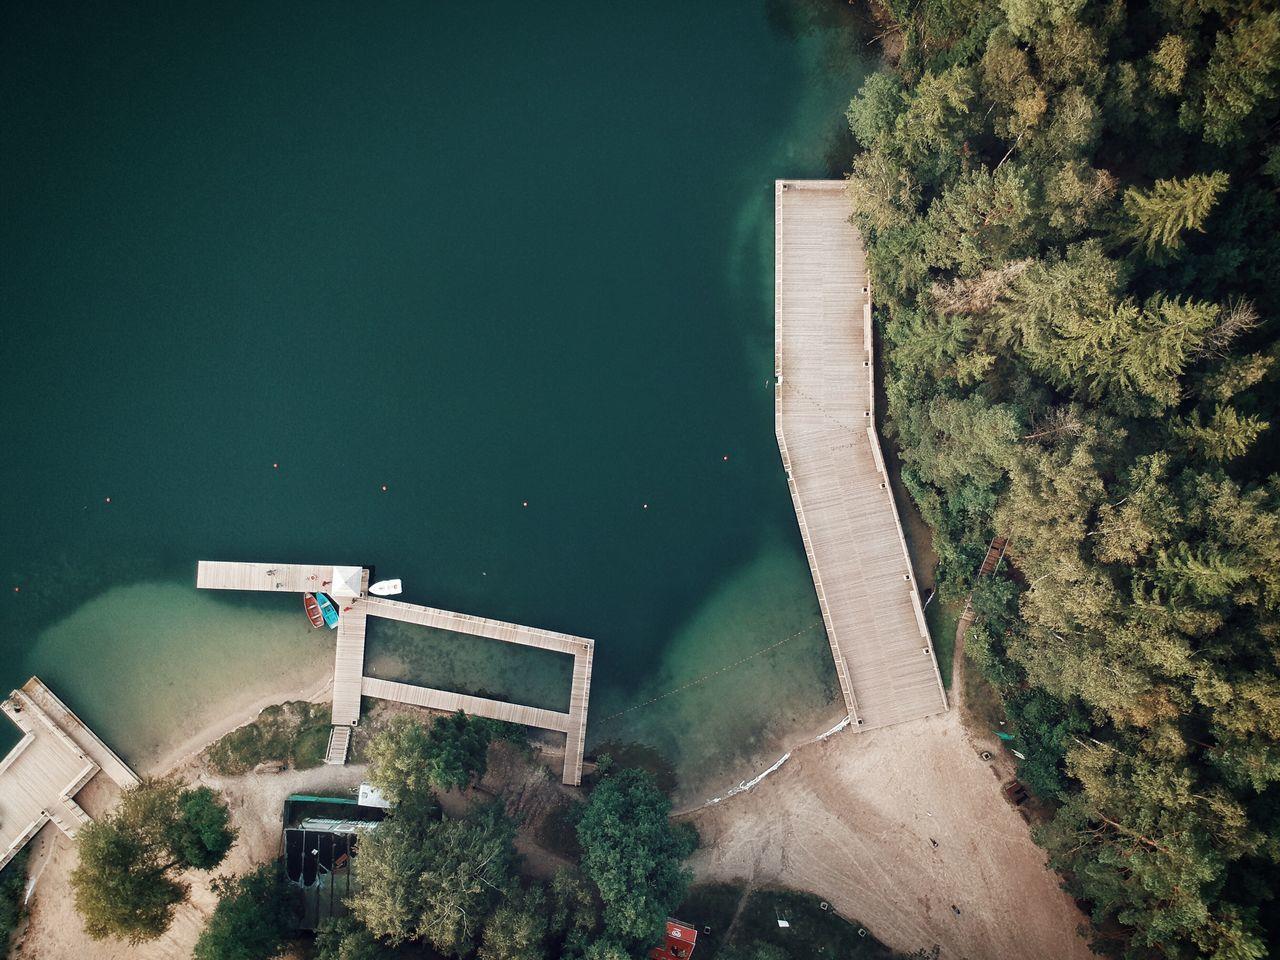 Aerial View Of Lakeshore